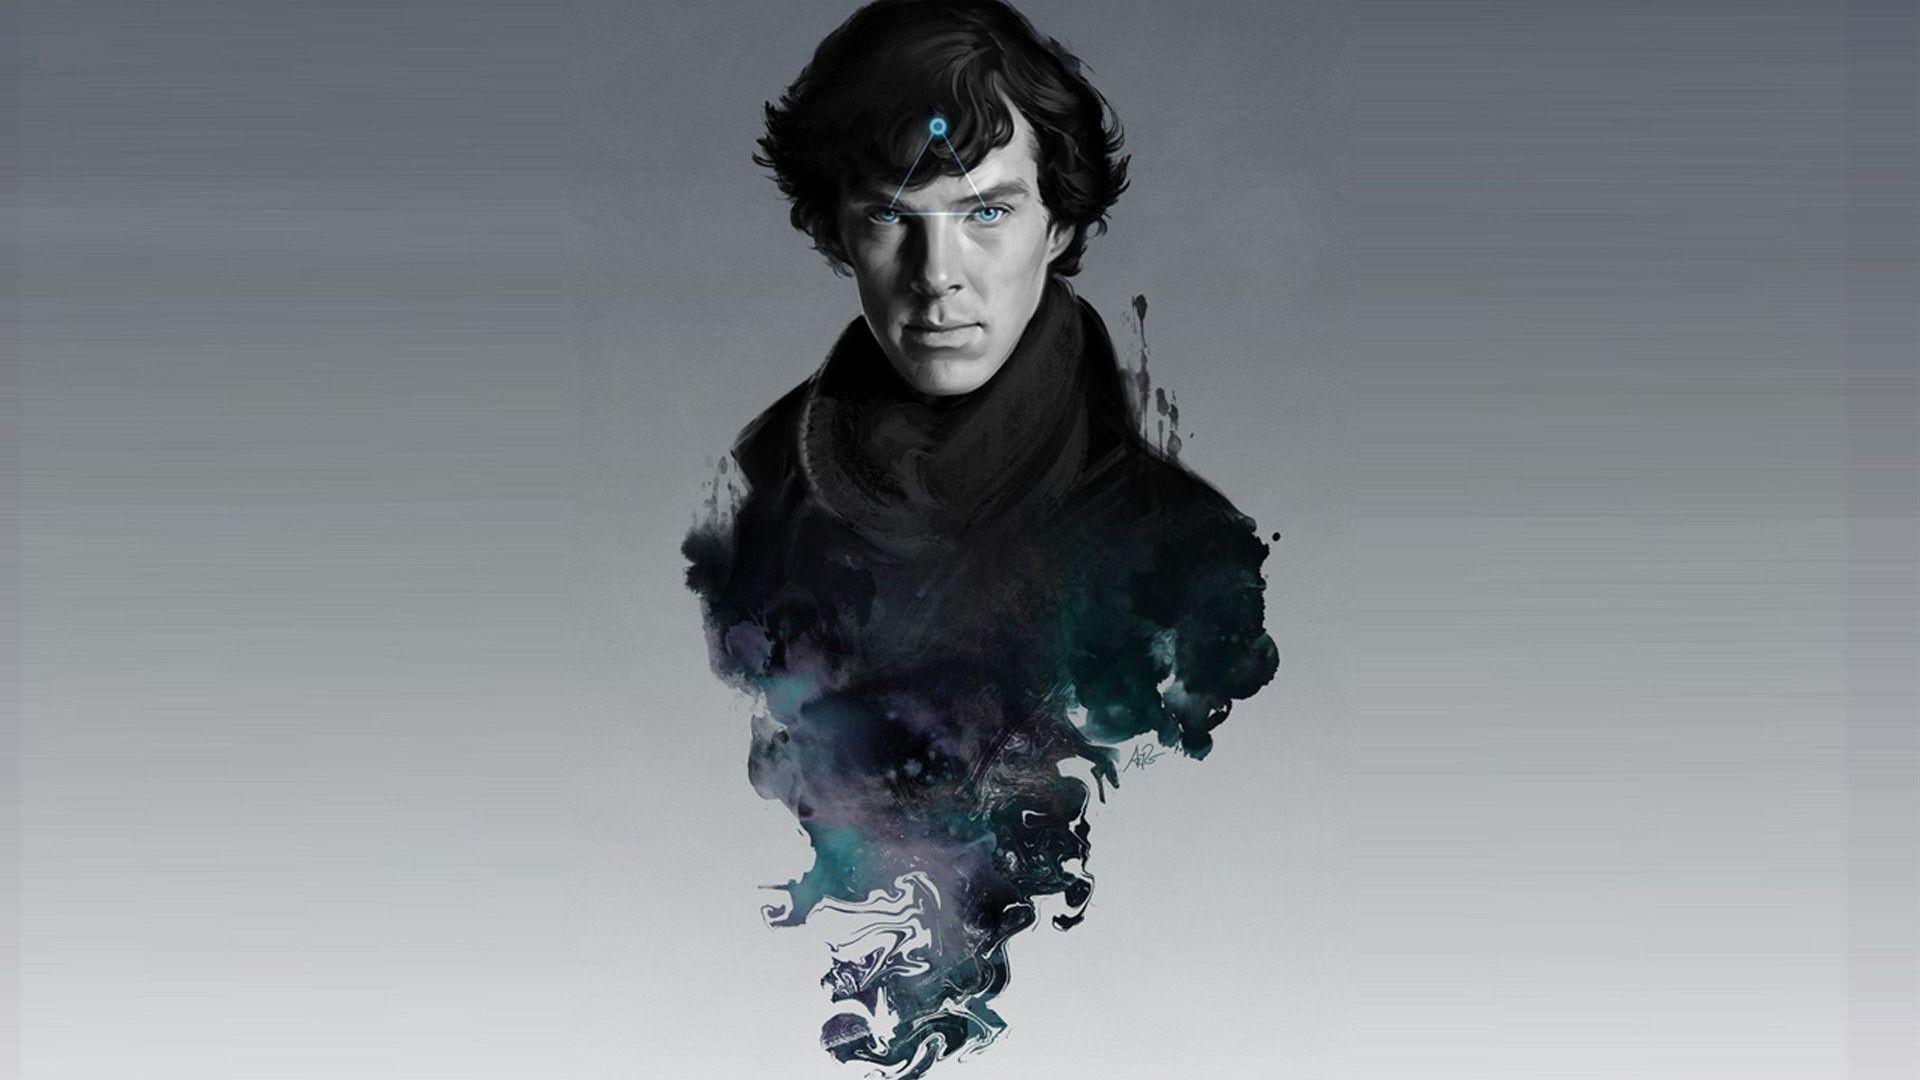 1920x1080 Px Benedict Cumberbatch Sherlock Holmes